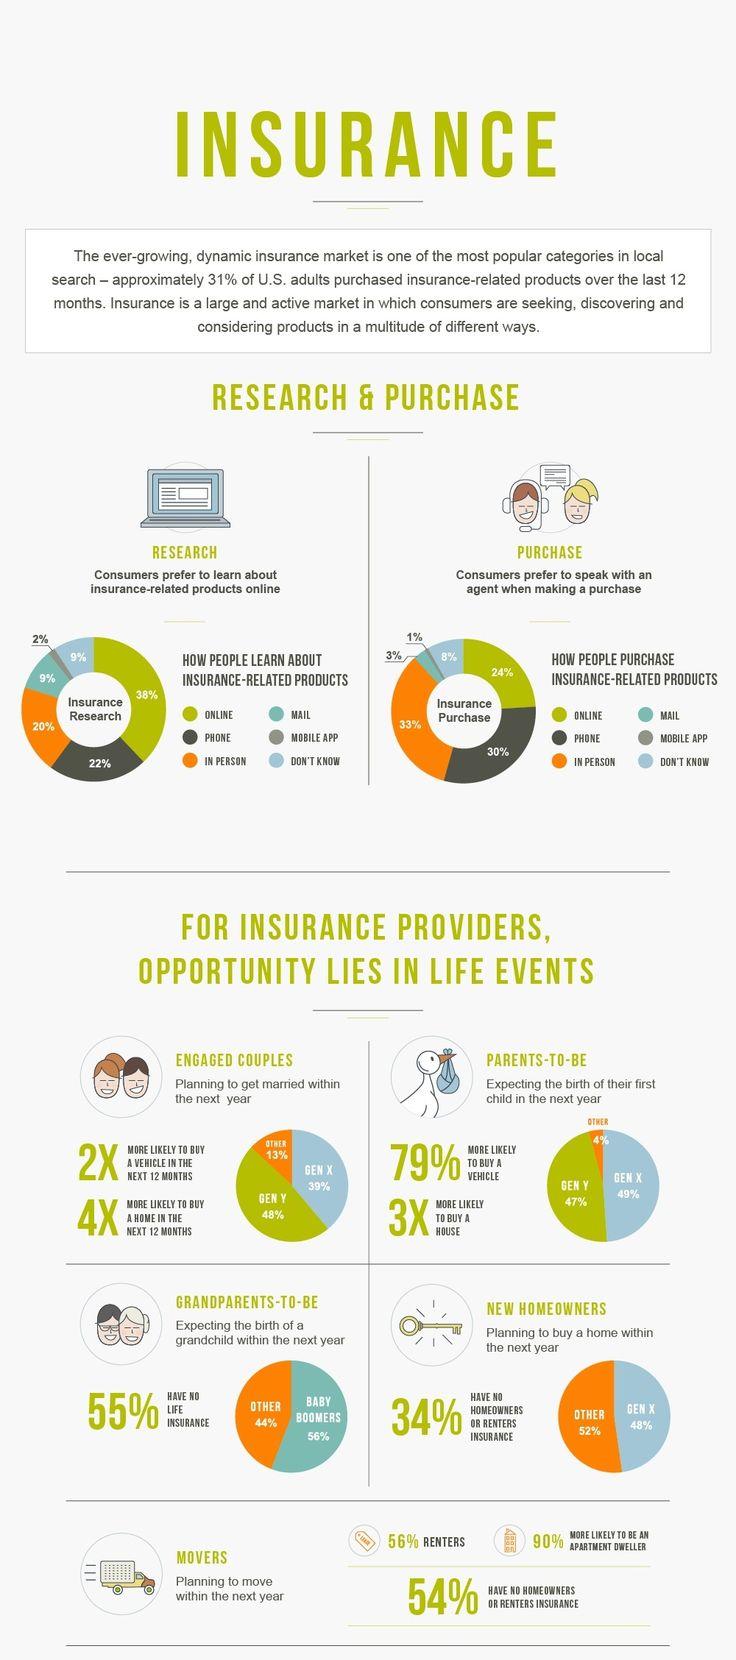 Bajaj Allianz offers individual health insurance, family